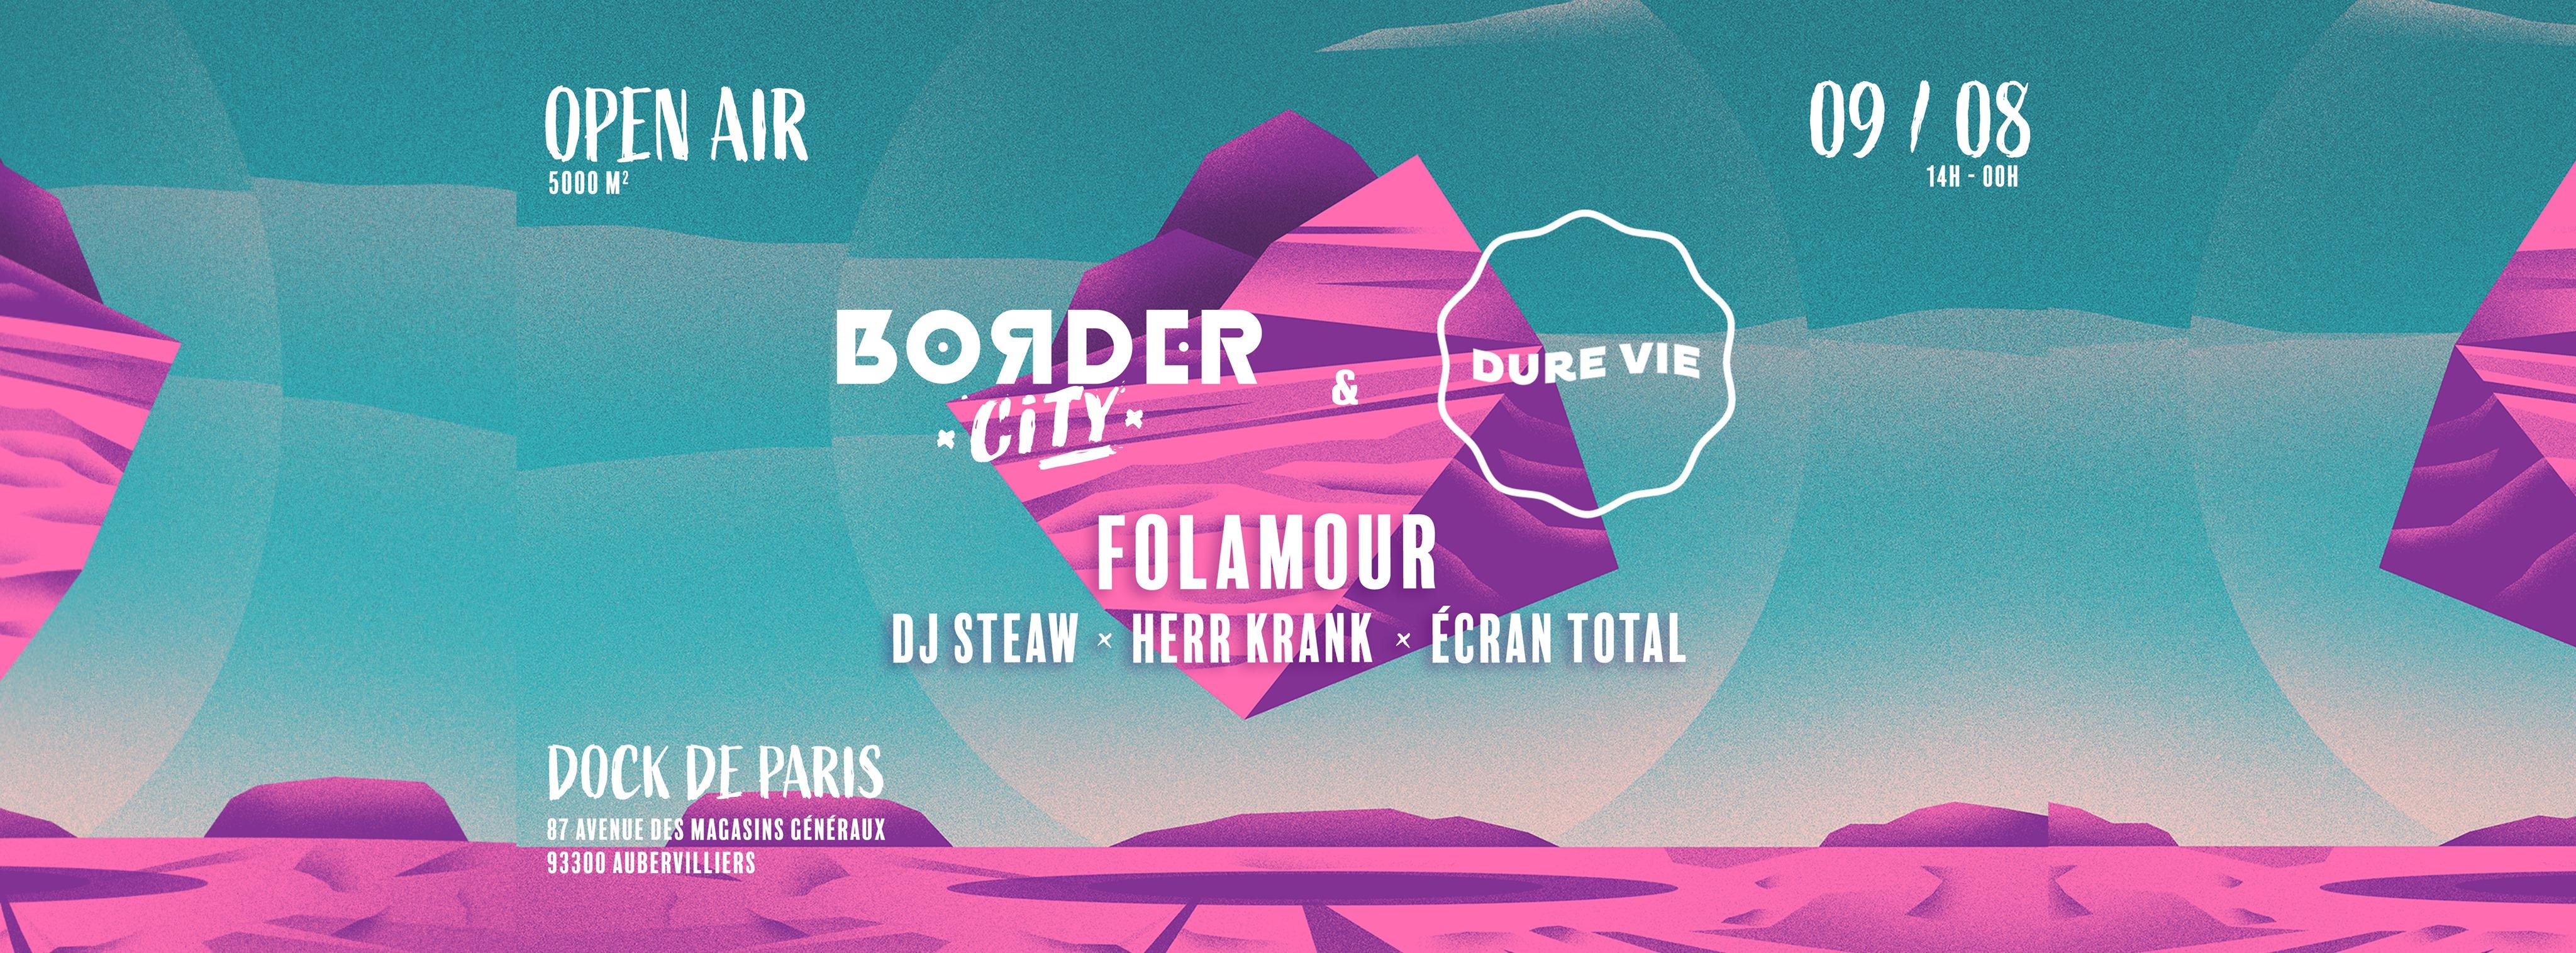 Border City x Dure Vie, Folamour, Dj Steaw, Herr Krank